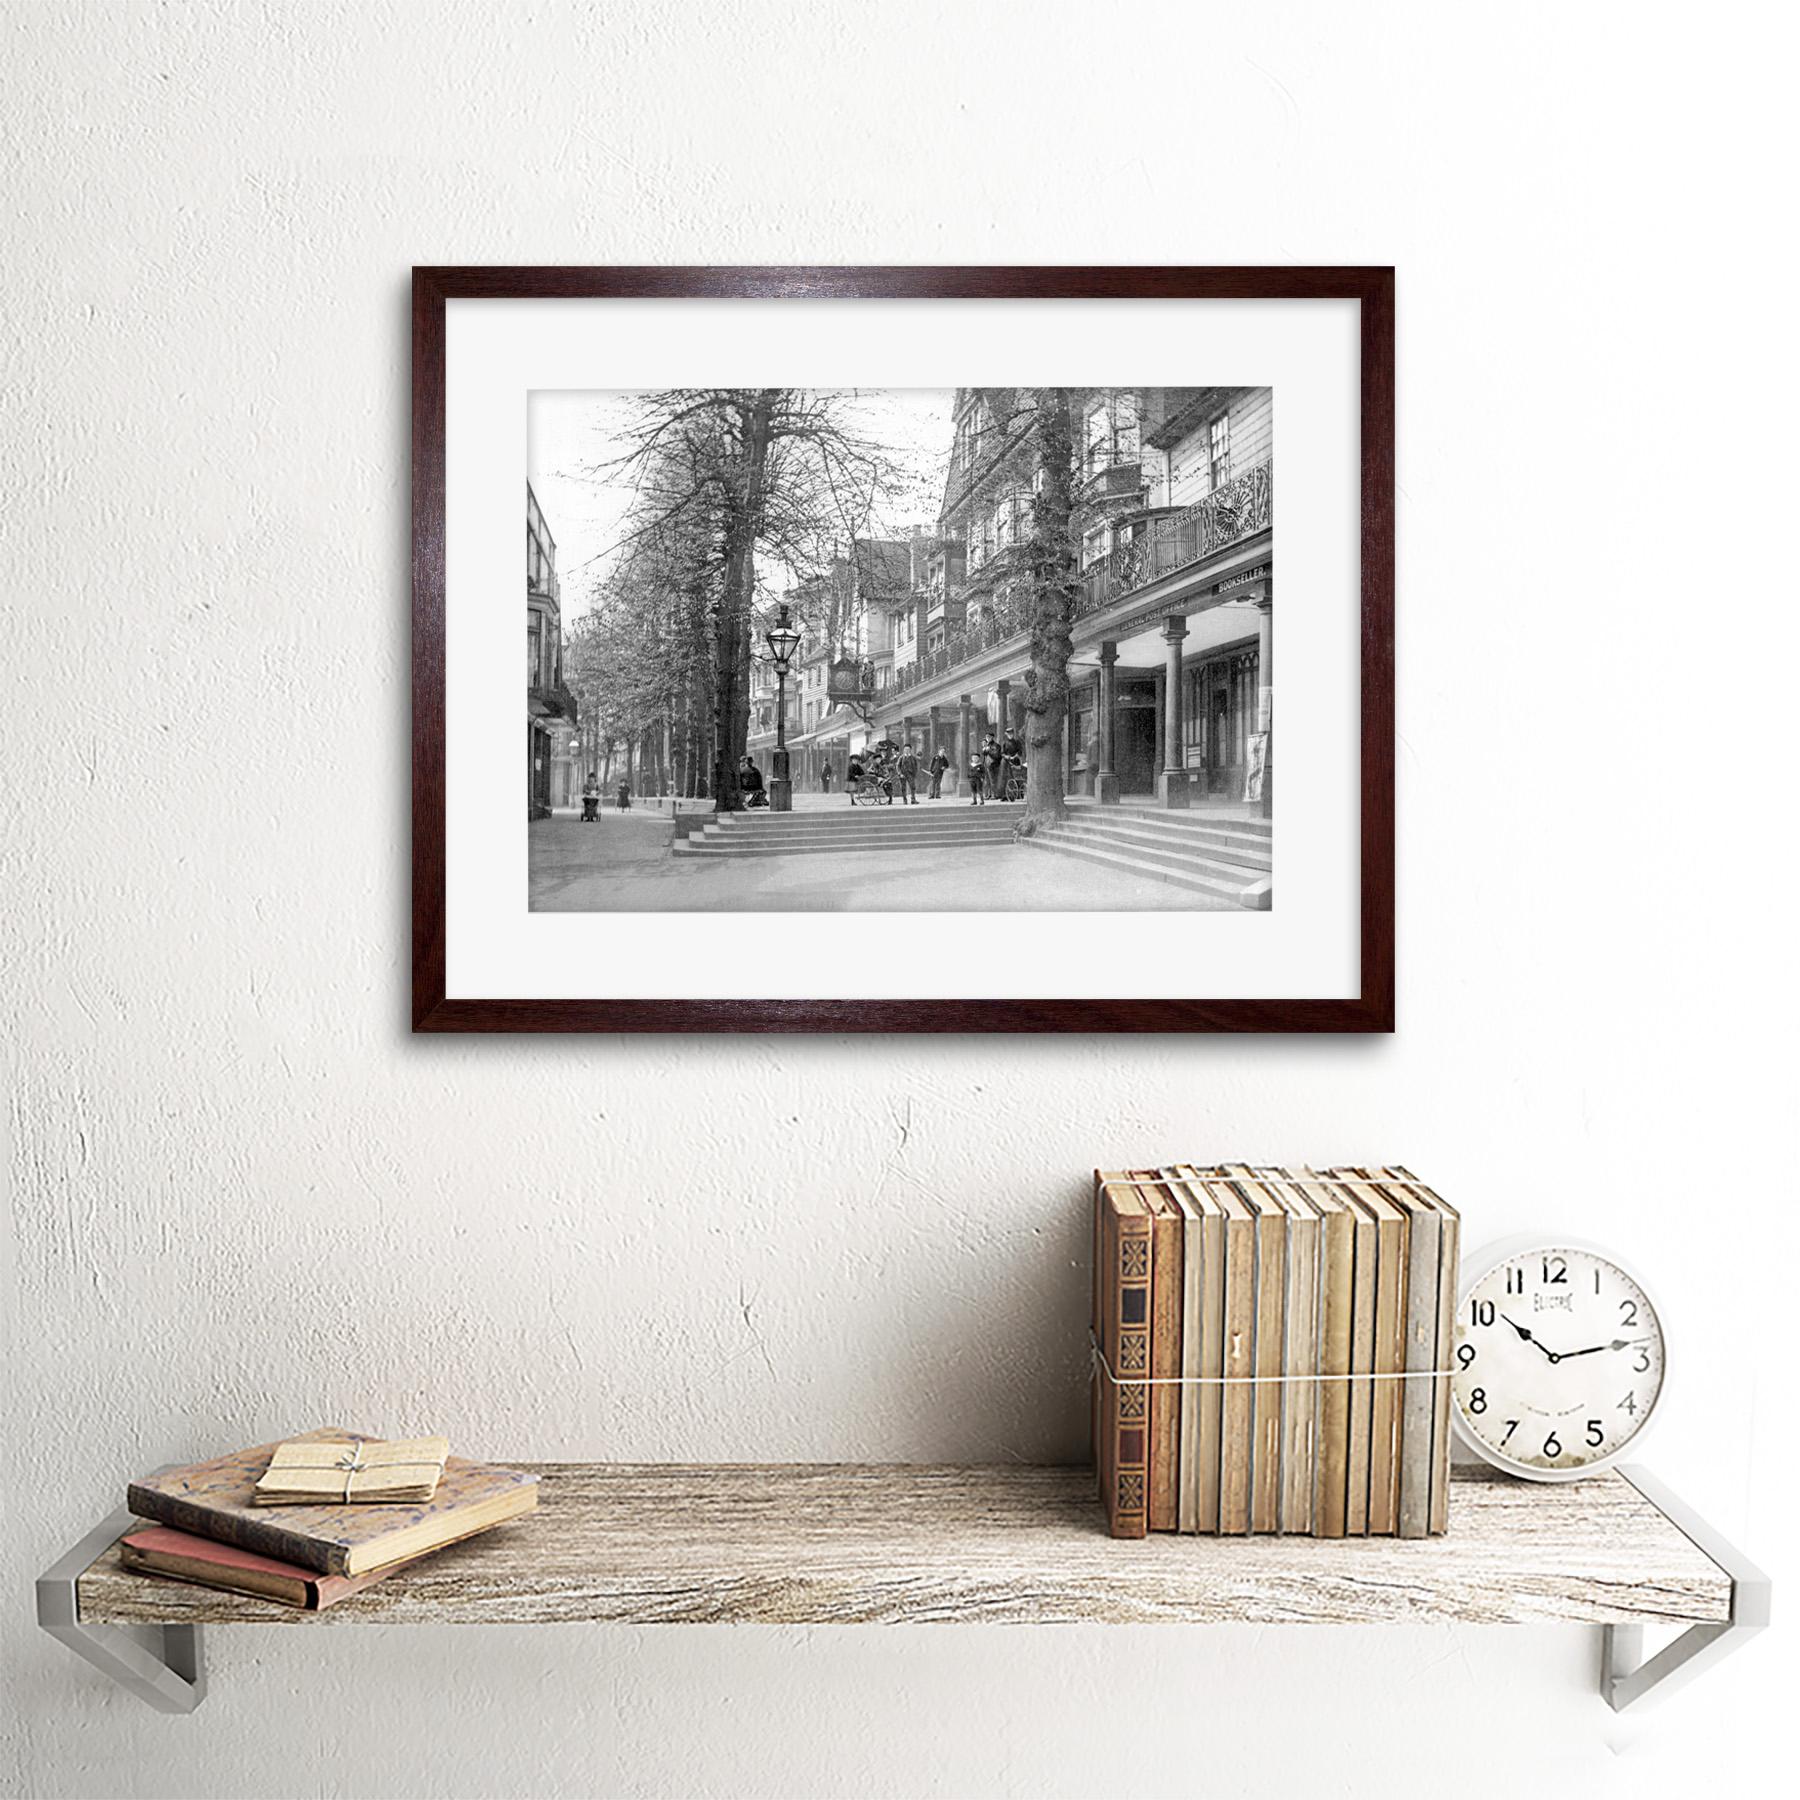 Vintage Foto Tunbridge Wells cobijas Inglaterra enmarcado impresión 12x16 pulgadas